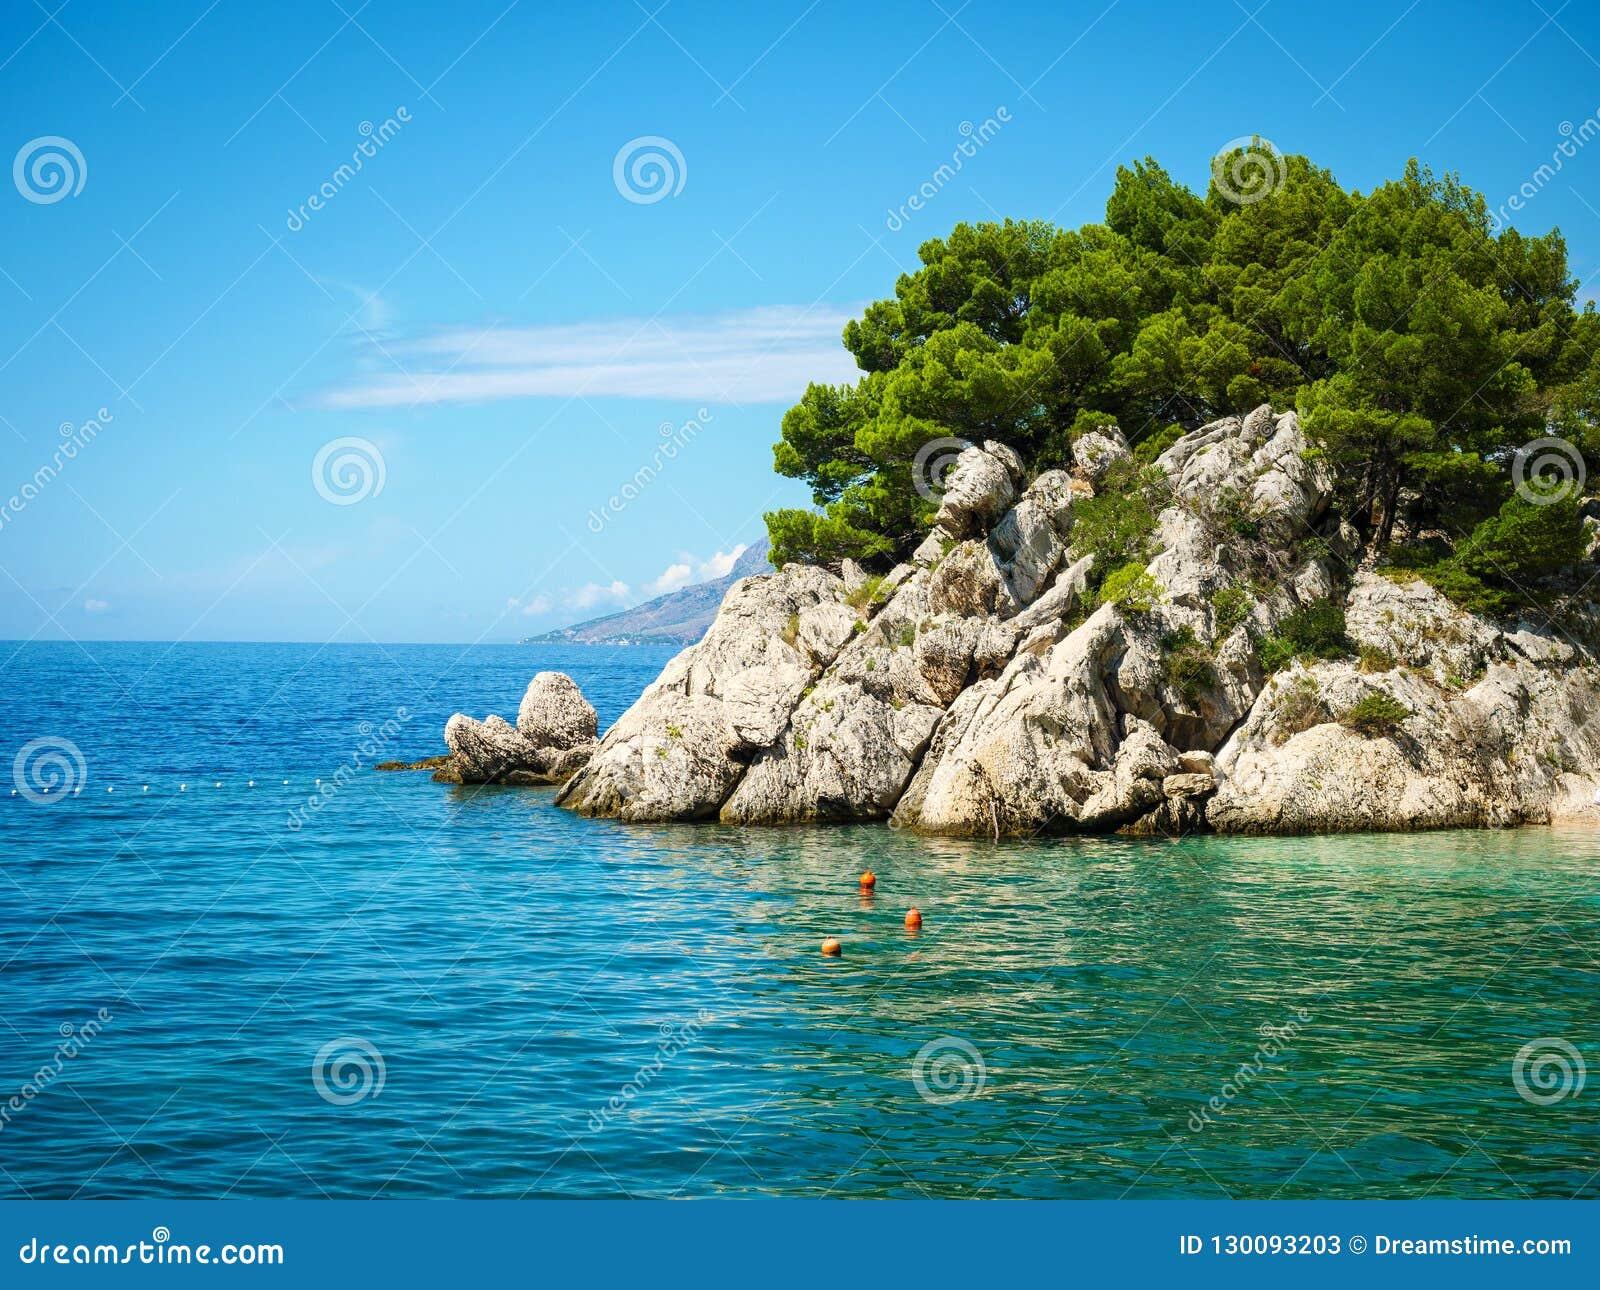 Paradise beach in Croatia, Brela, Dalmatia